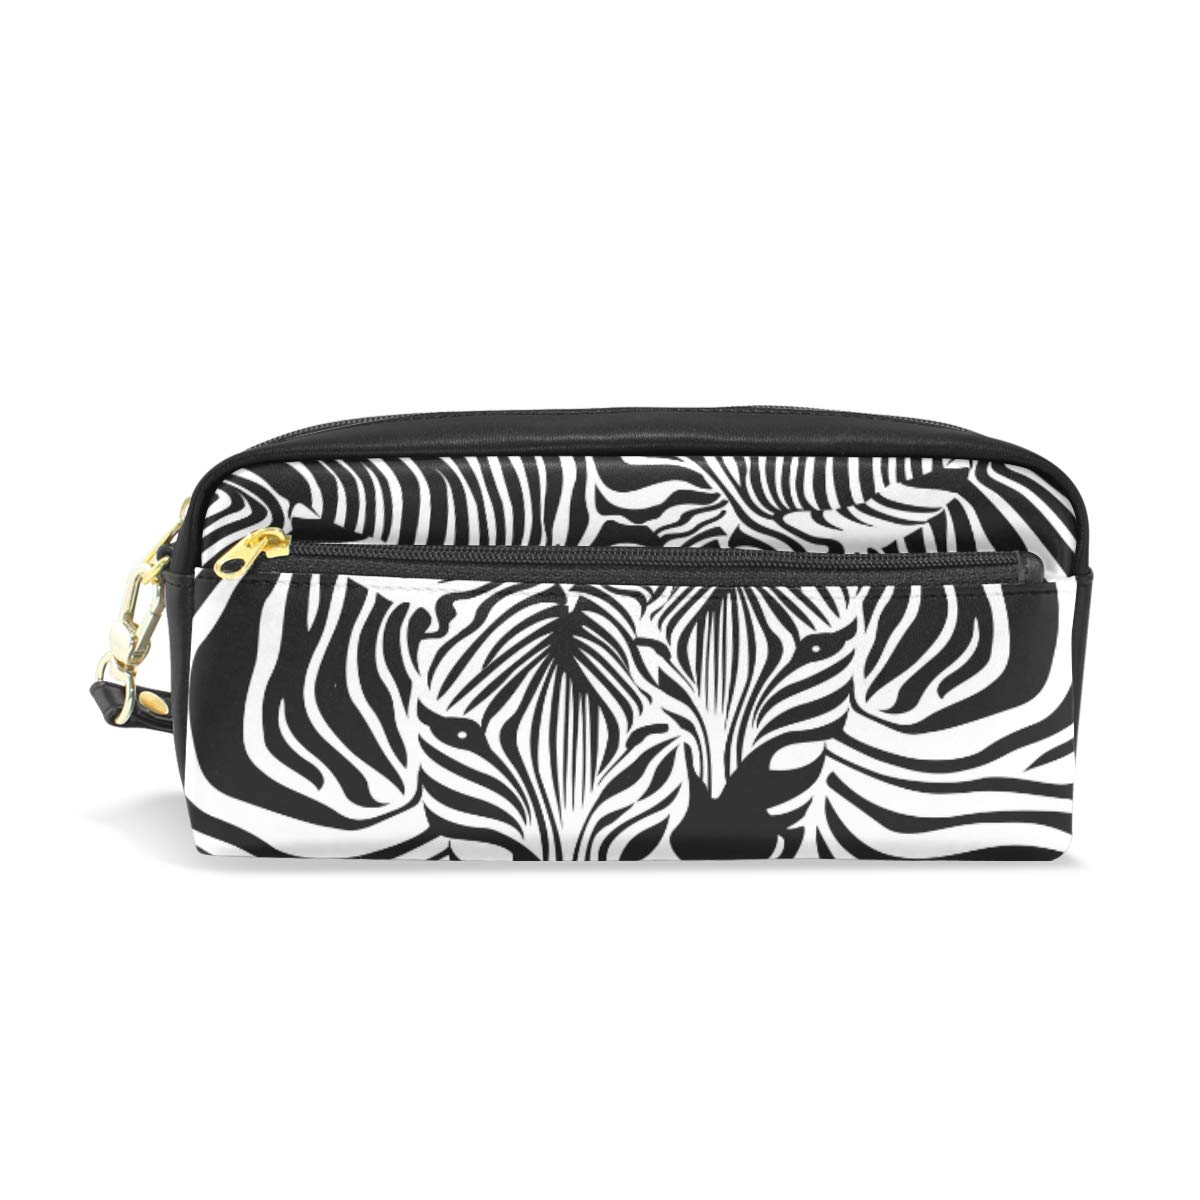 Pencil Case Big Capacity Pencil Bag Makeup Pen Pouch Animal Zebra Leopard Print Durable Students Stationery Pen Holder for School/Office